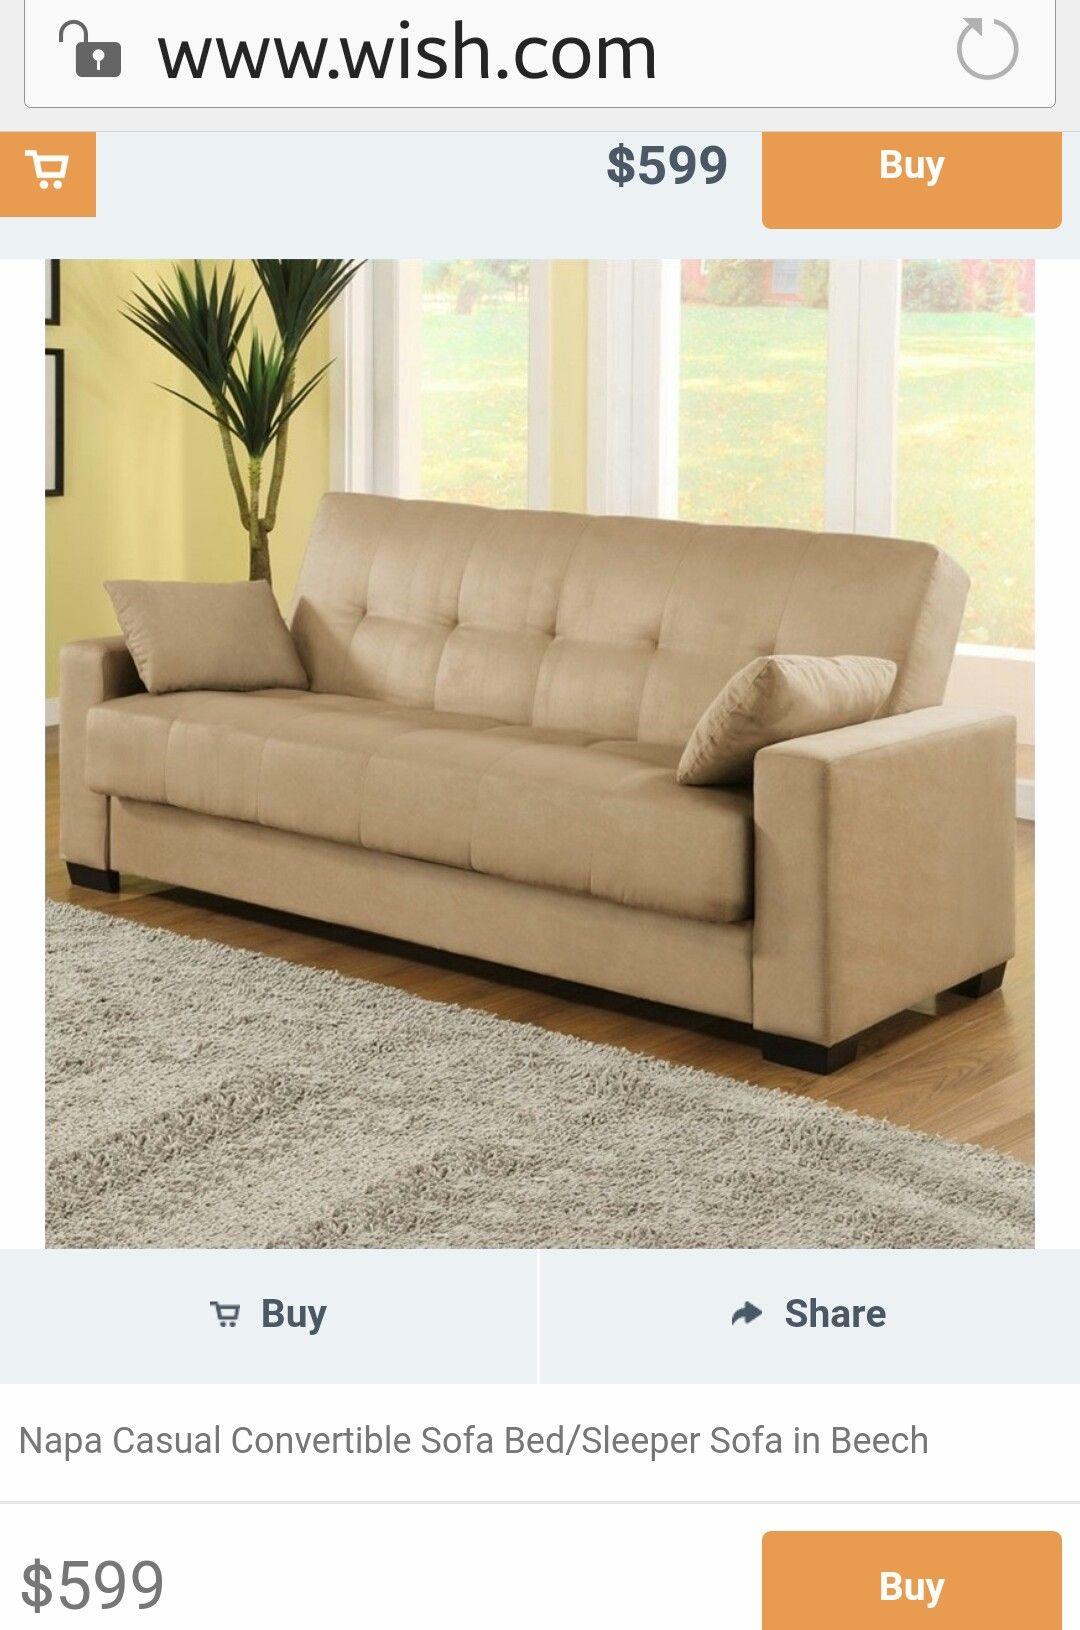 Napa Casual Convertible Sofa Bed/Sleeper Sofa in Beech | FOR THE ...